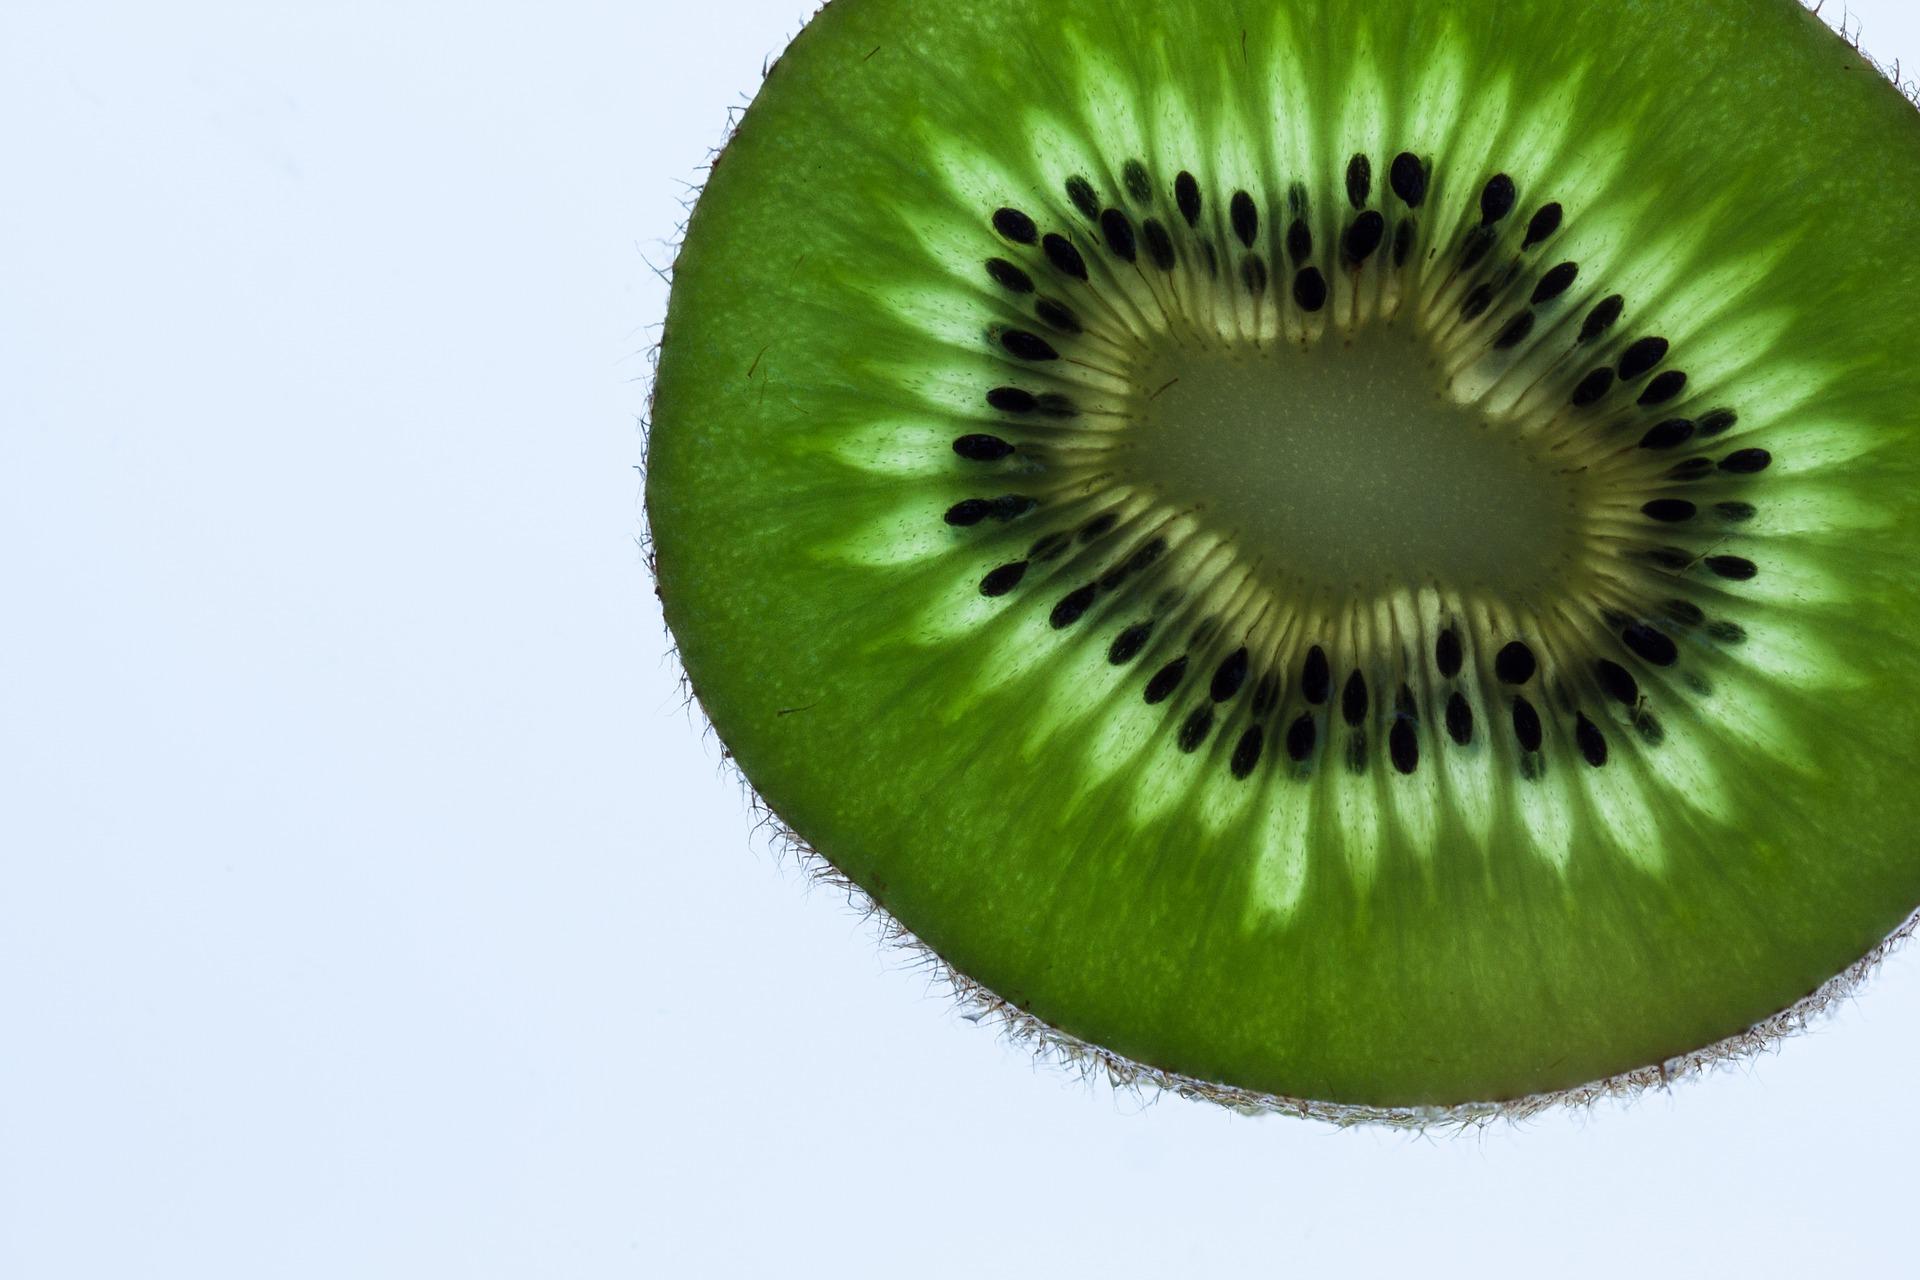 kiwi curar heridas